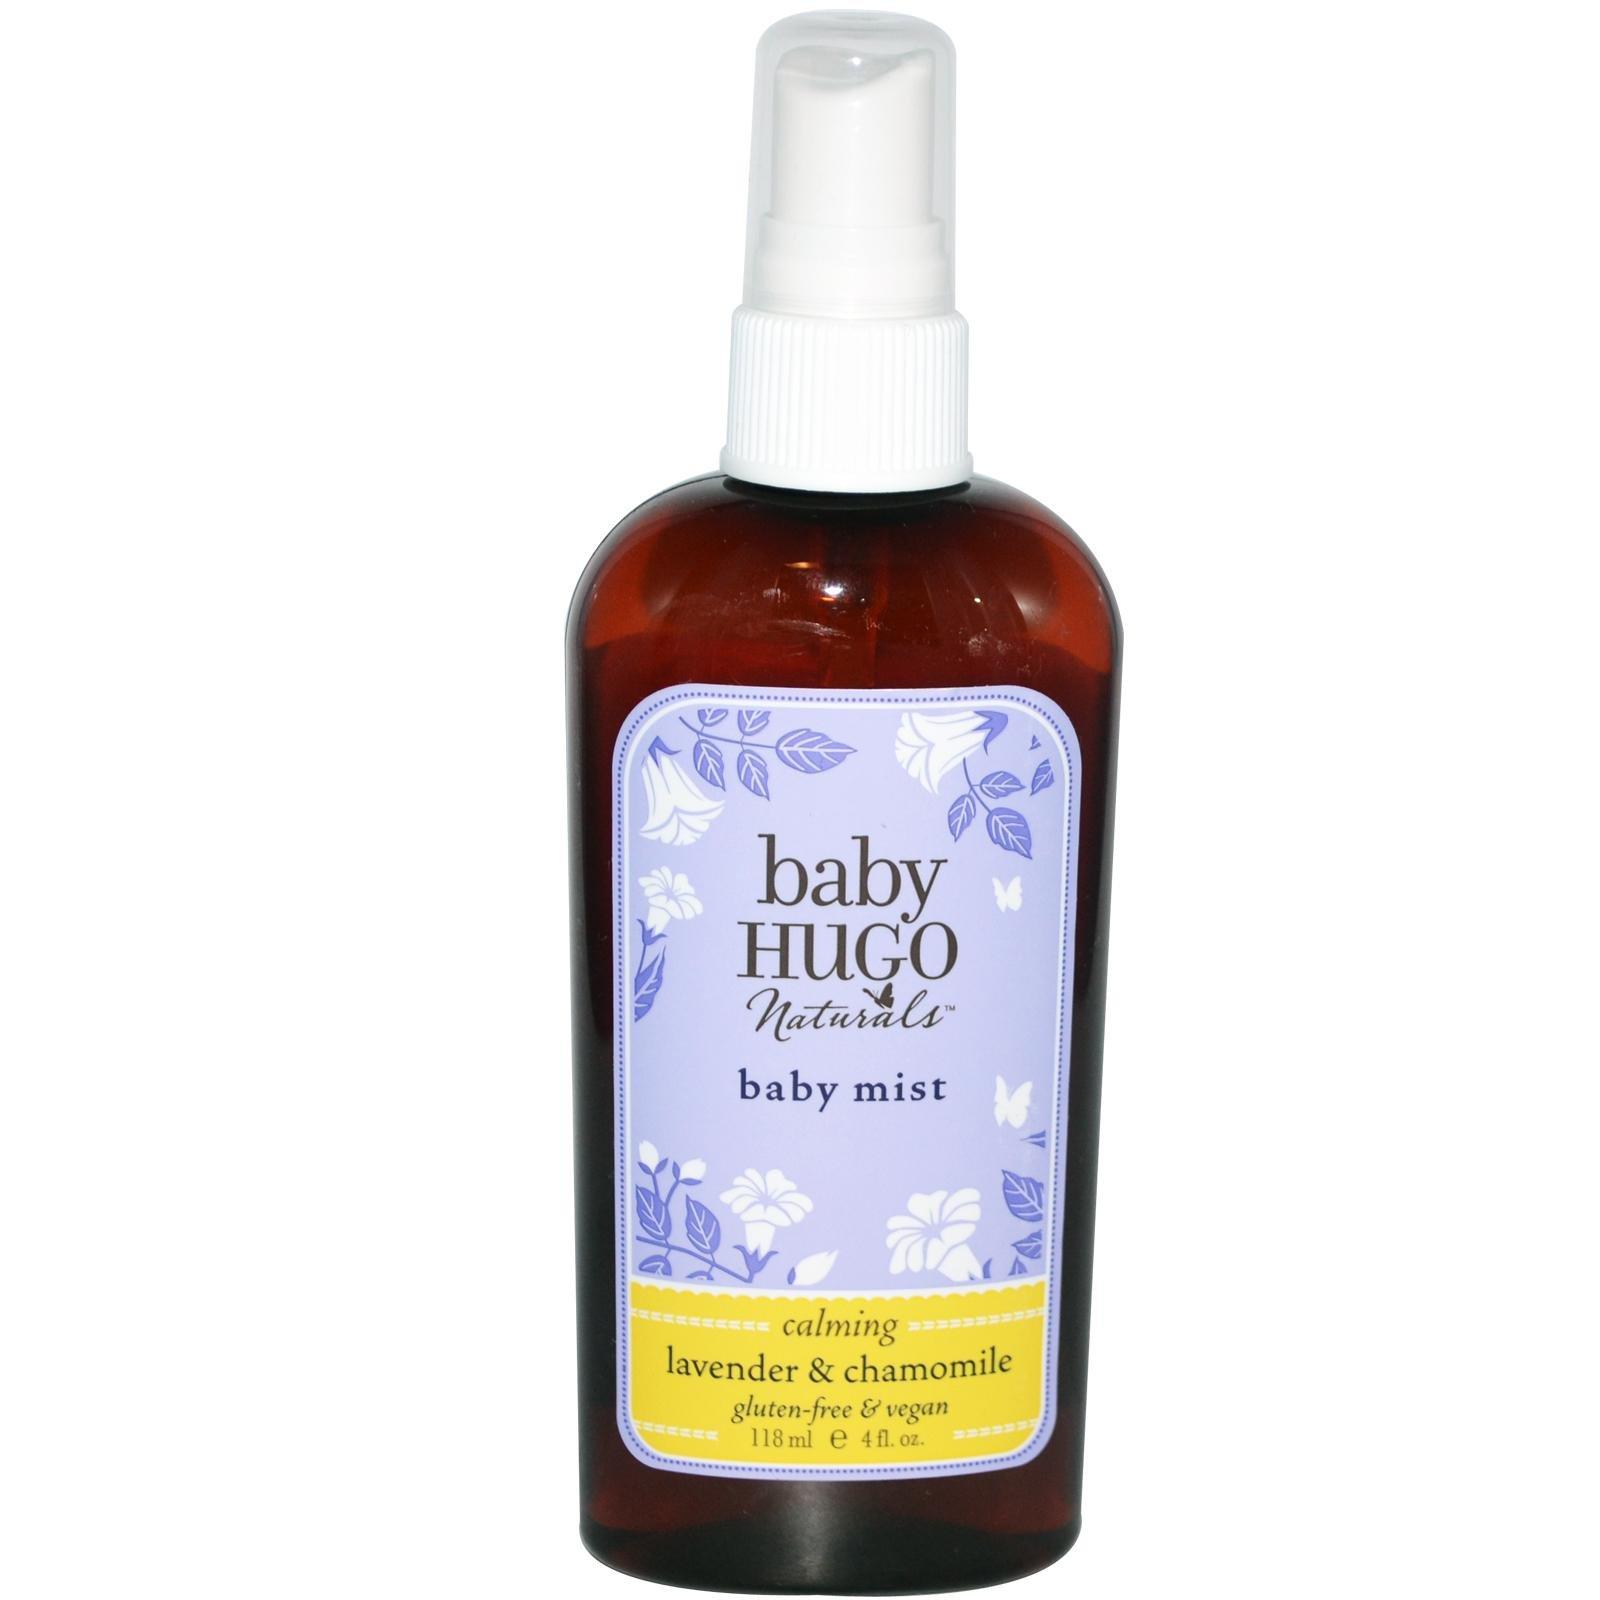 Baby Mist (Lavender & Chamomile)